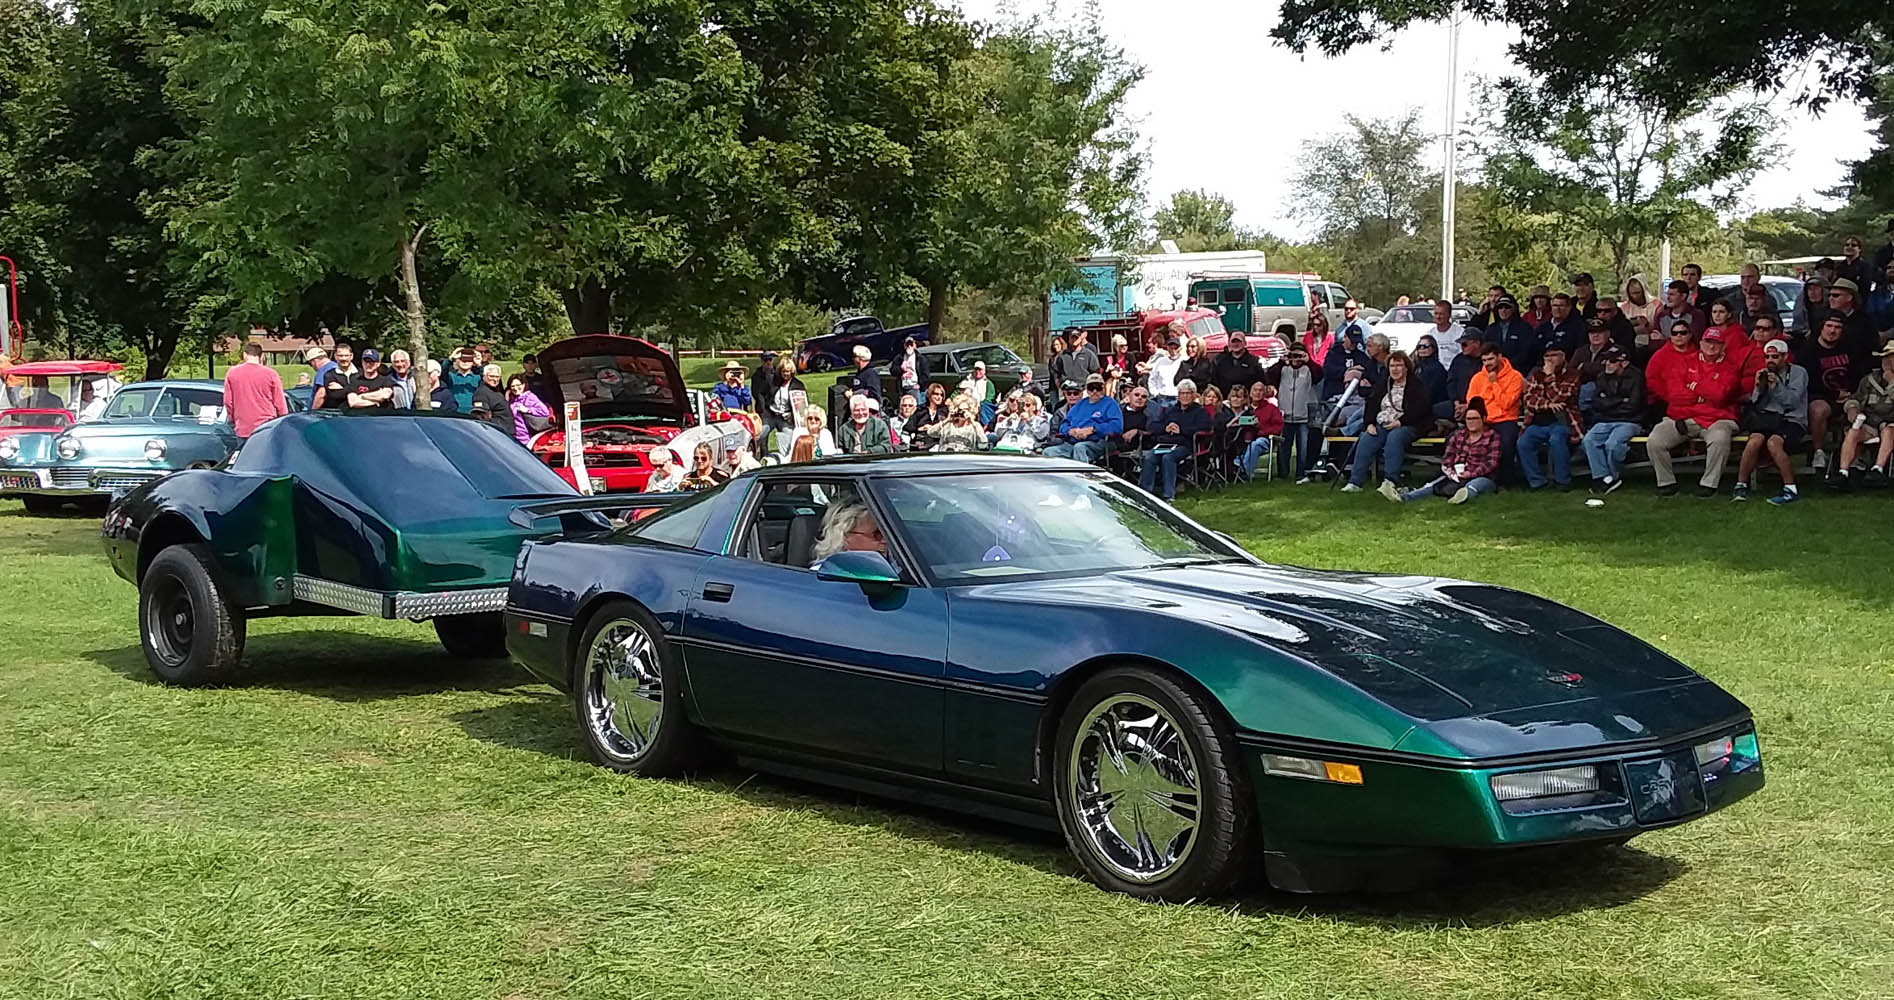 Top 25- 1986 Corvette & Trailer, Hugh White 1